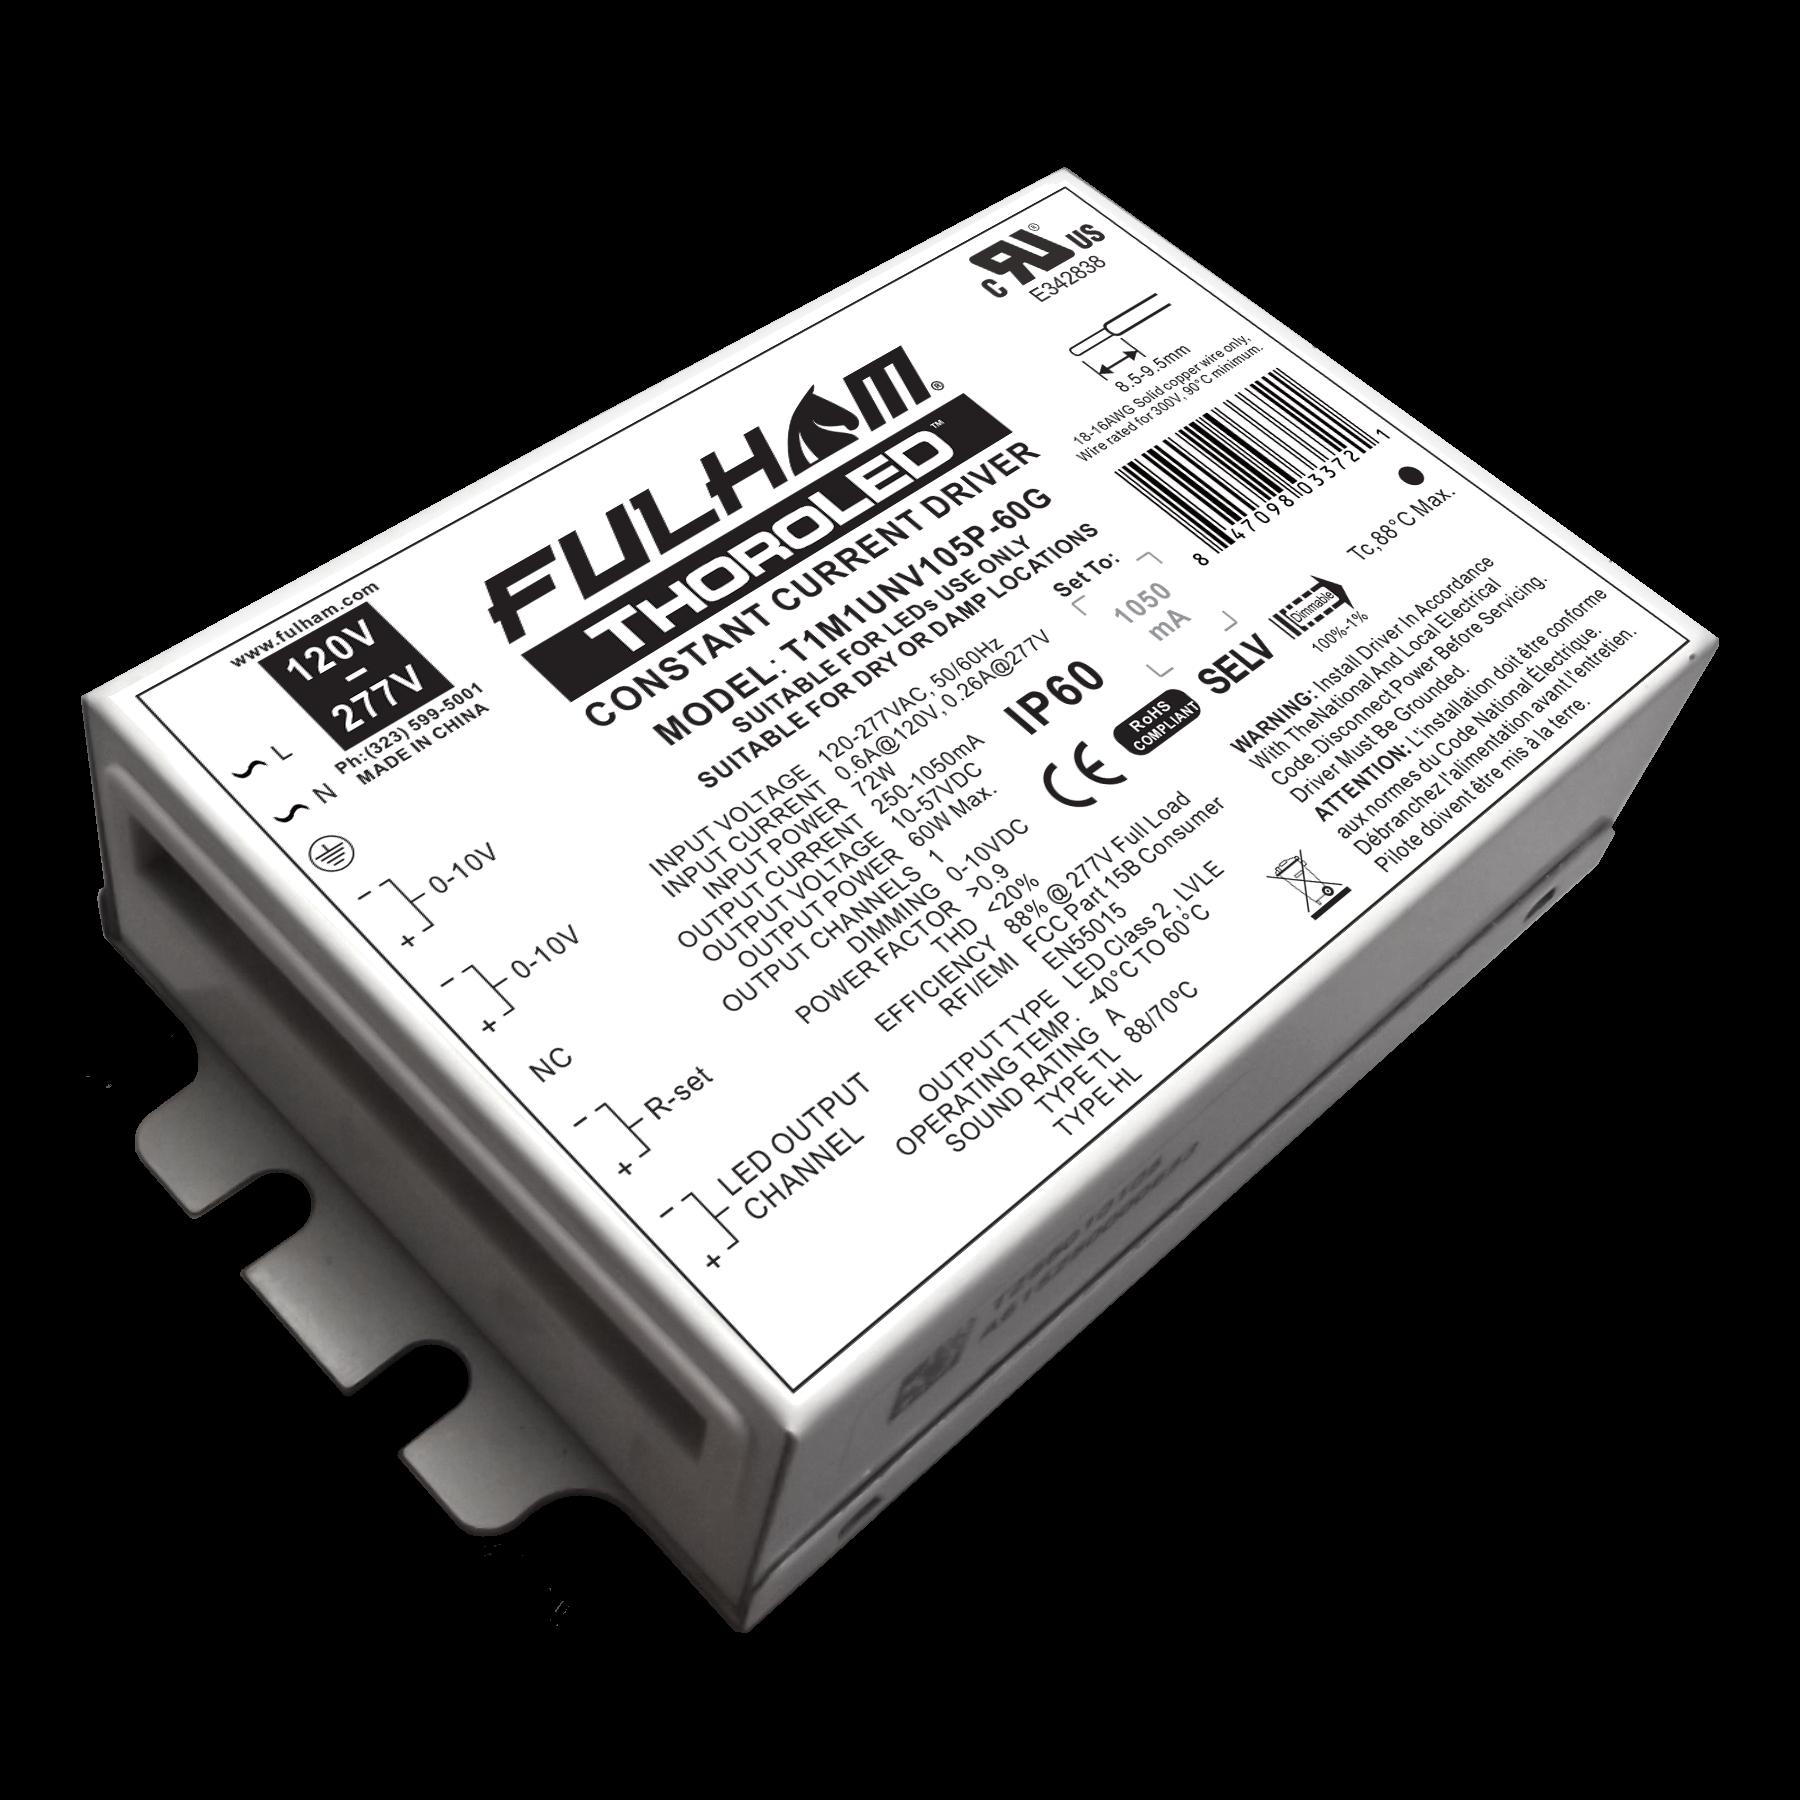 FUL T1M1UNV105P-60G 0-10V Dimming LED Driver 60W UNV PG1050 1CH WorkHorse LED - Single Channel